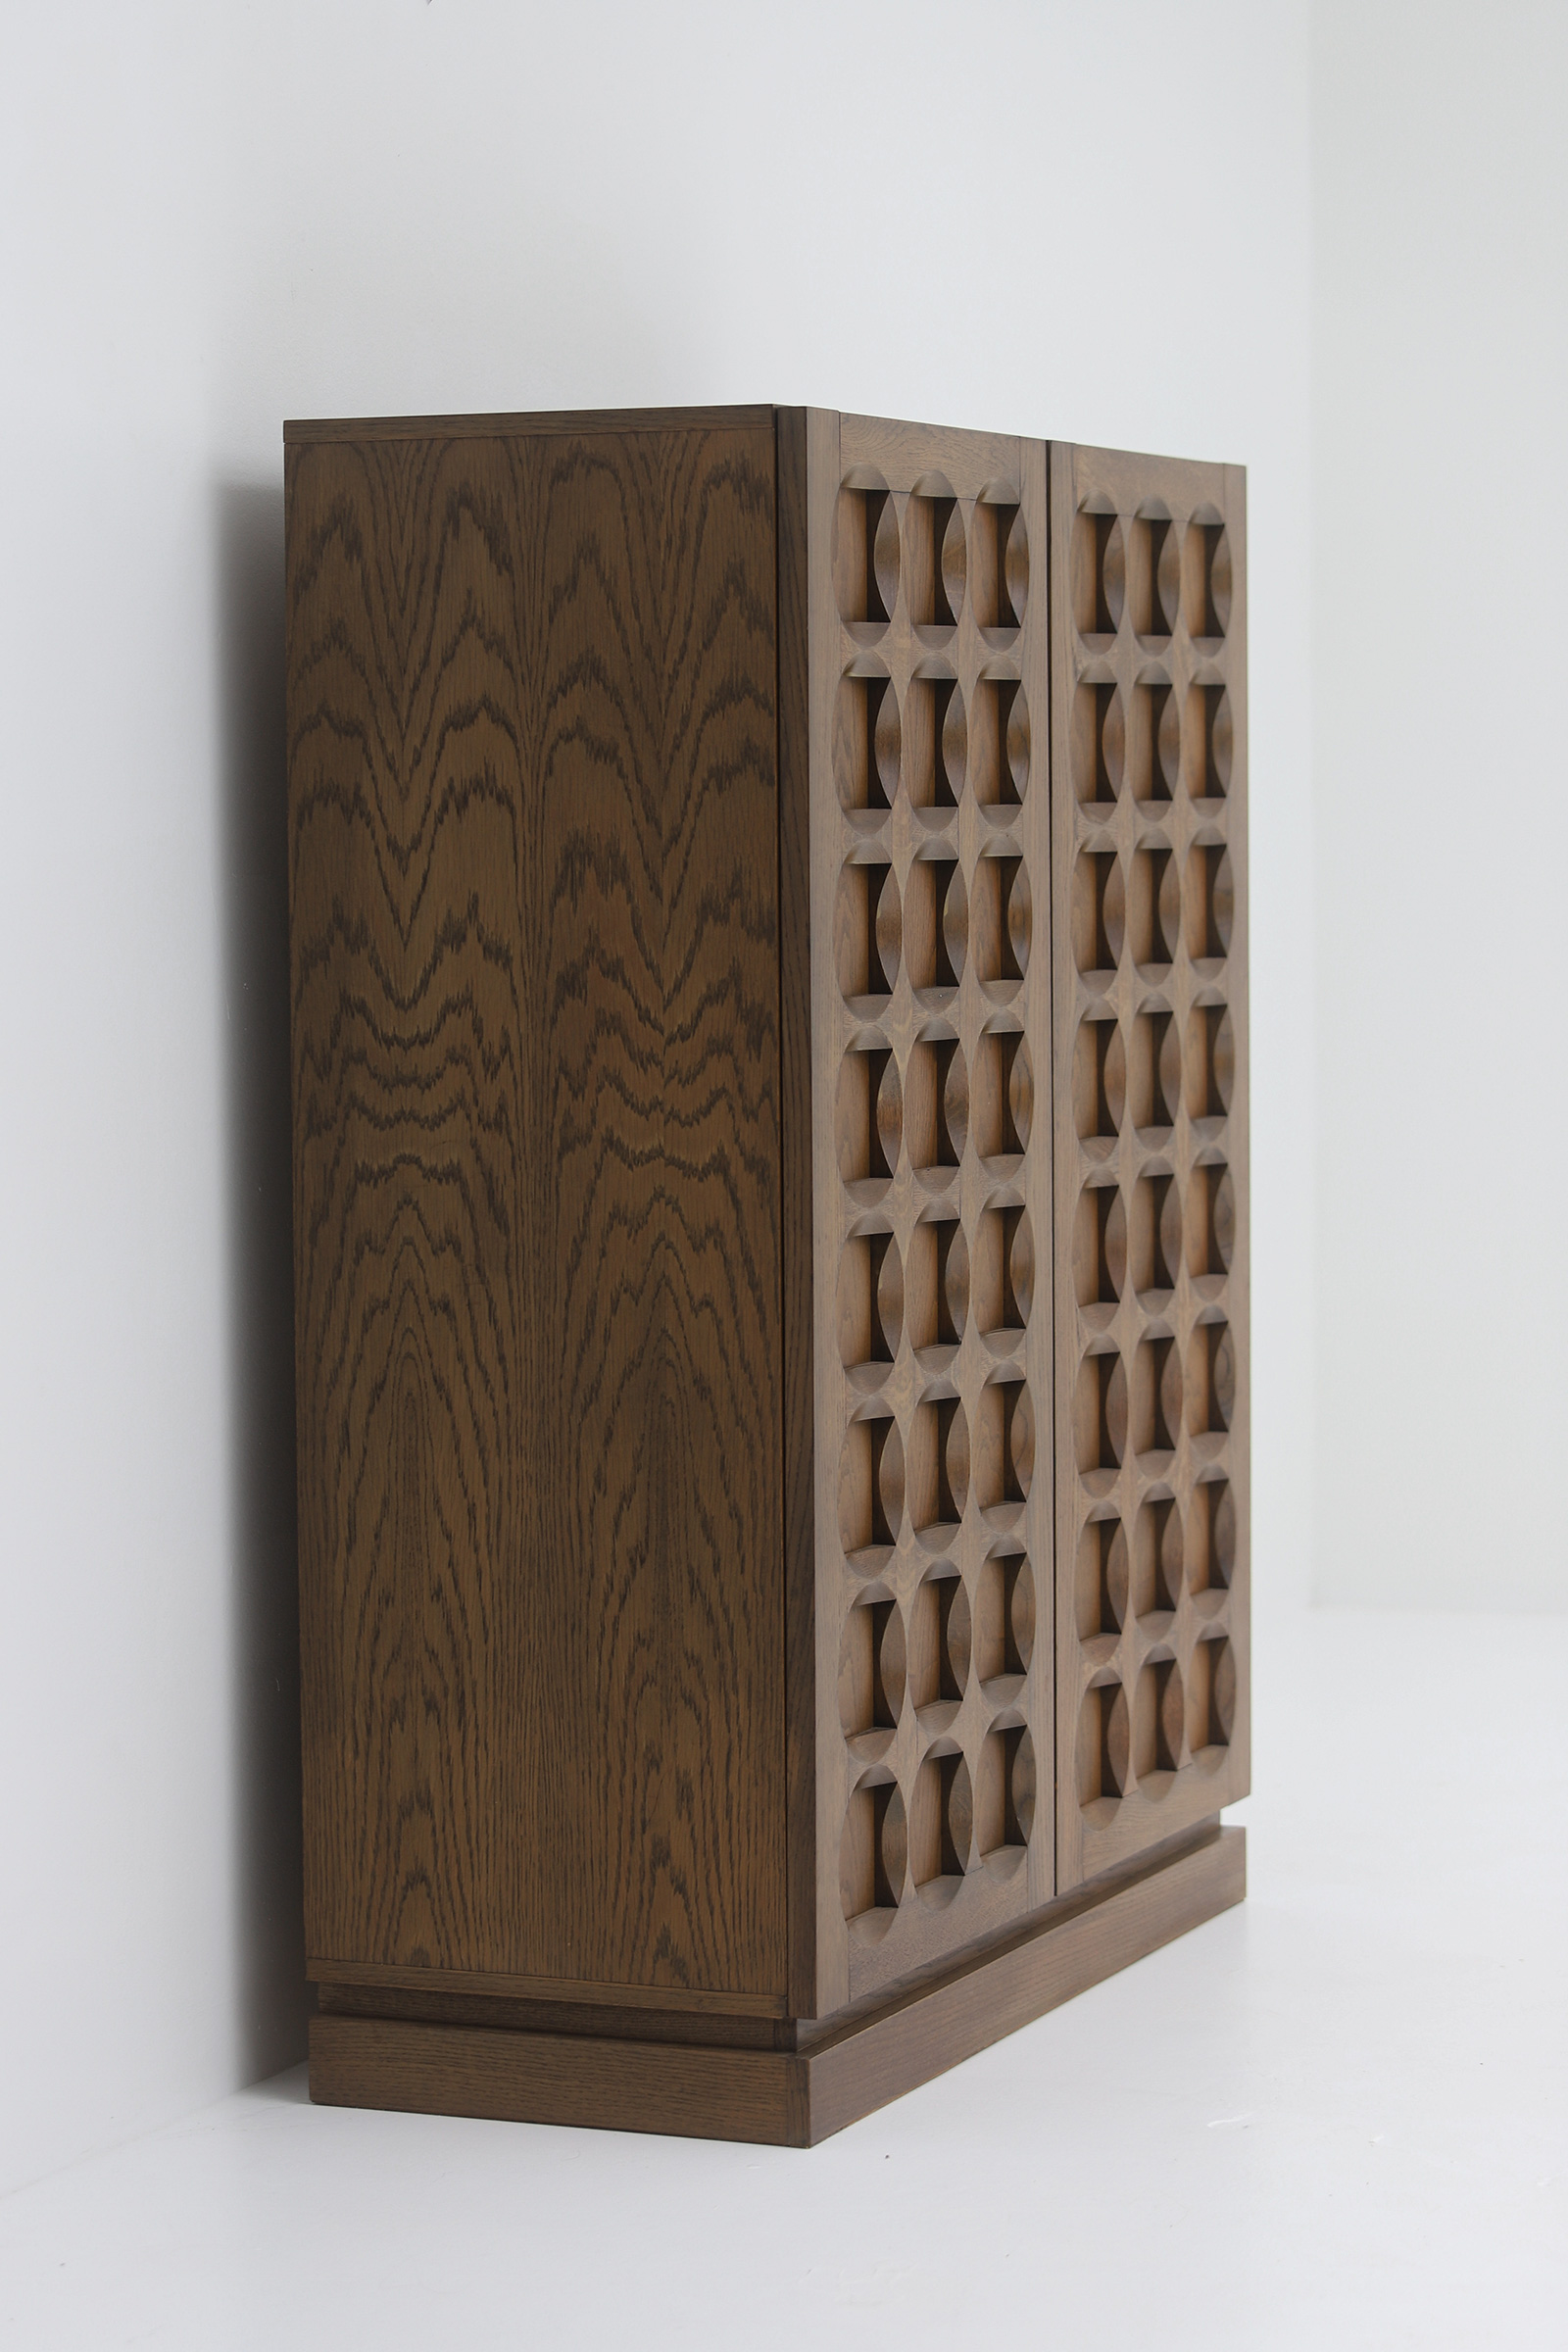 1970s Defour Cabinet Graphical Door Panels image 7